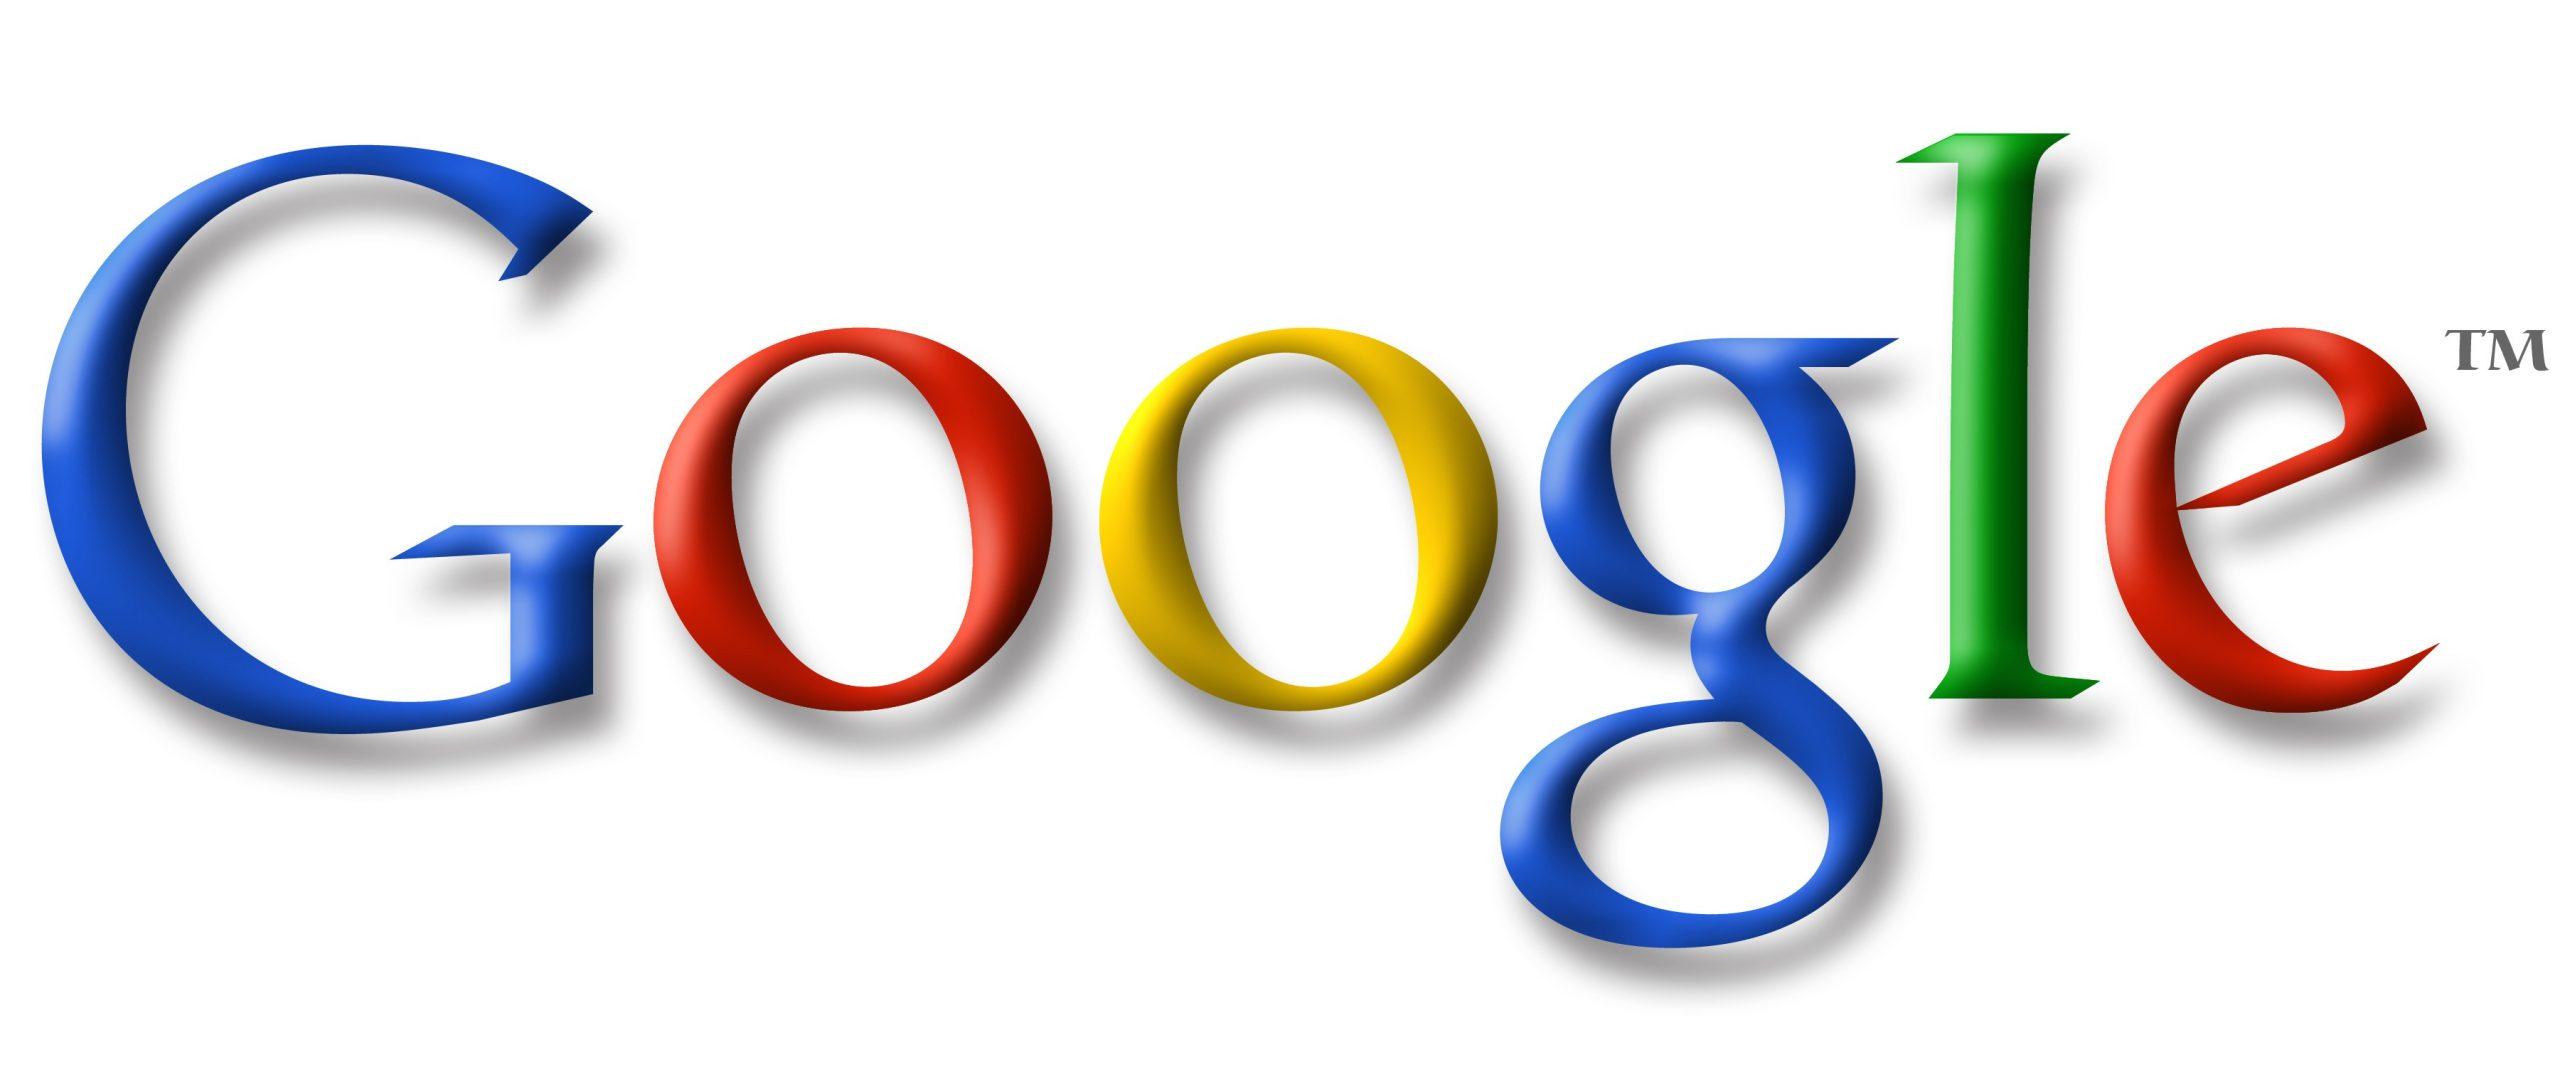 Google-Logosu